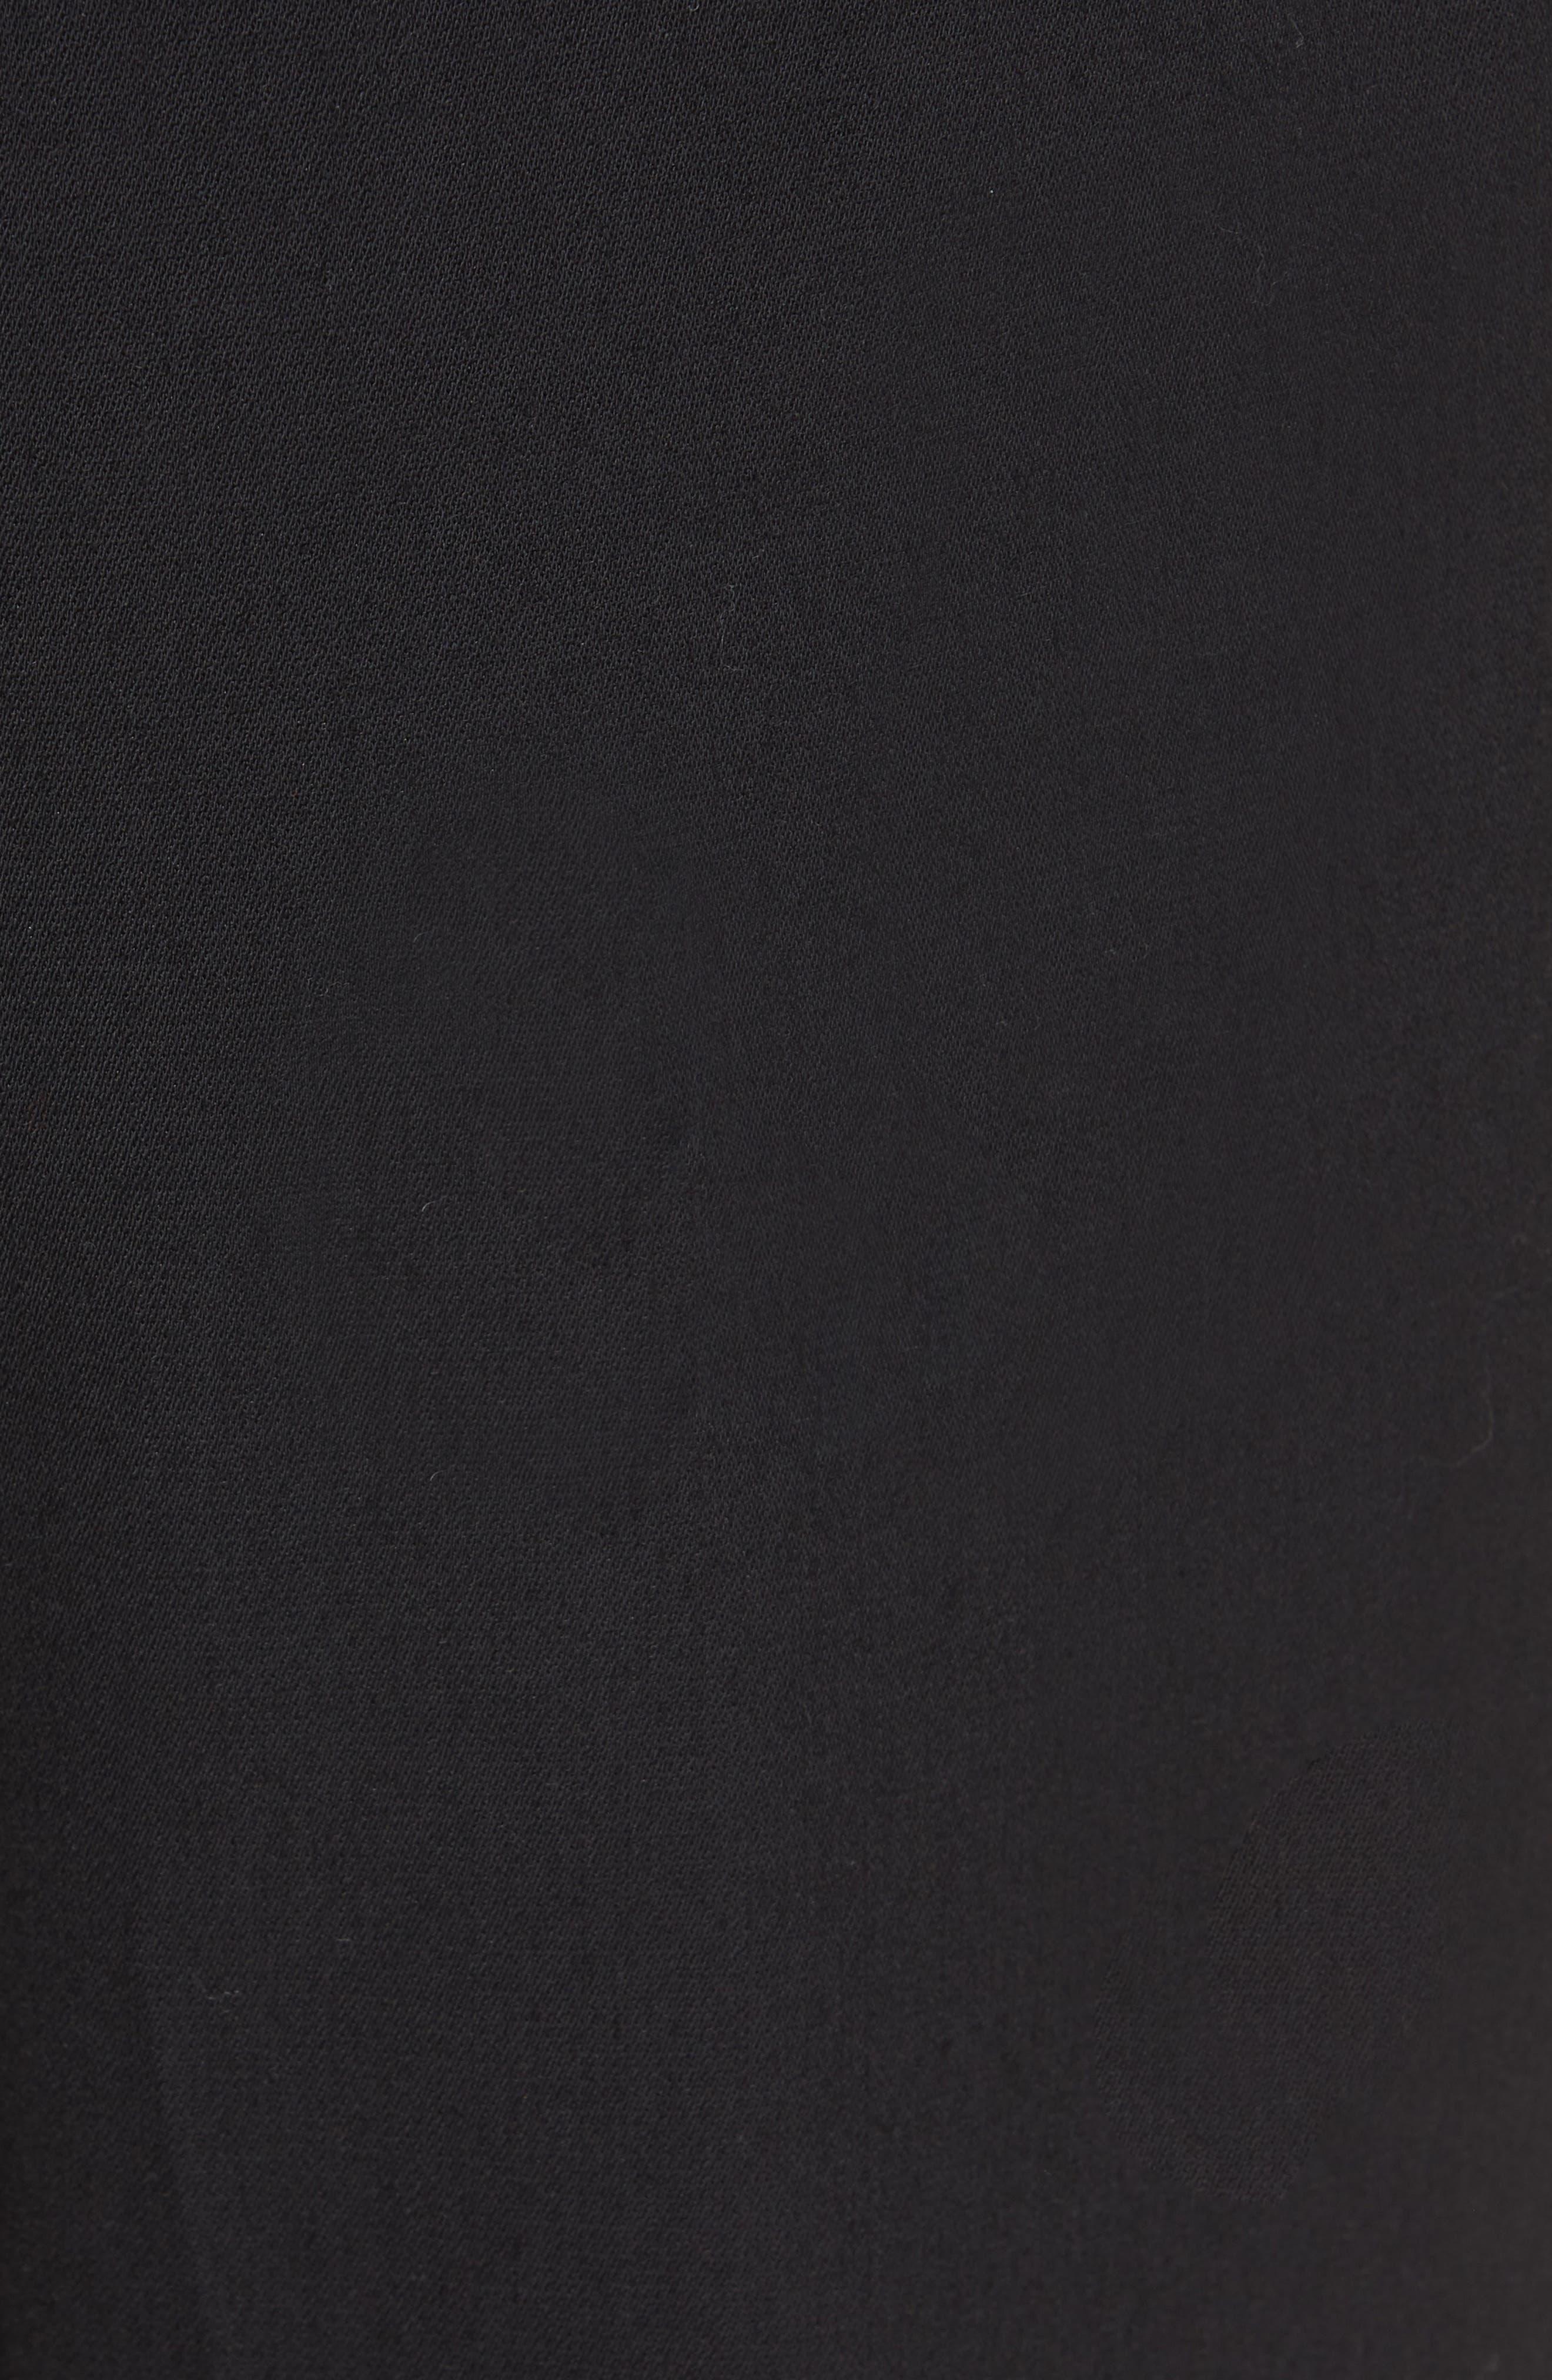 VINCE, Cuffed Jogger Pants, Alternate thumbnail 6, color, BLACK